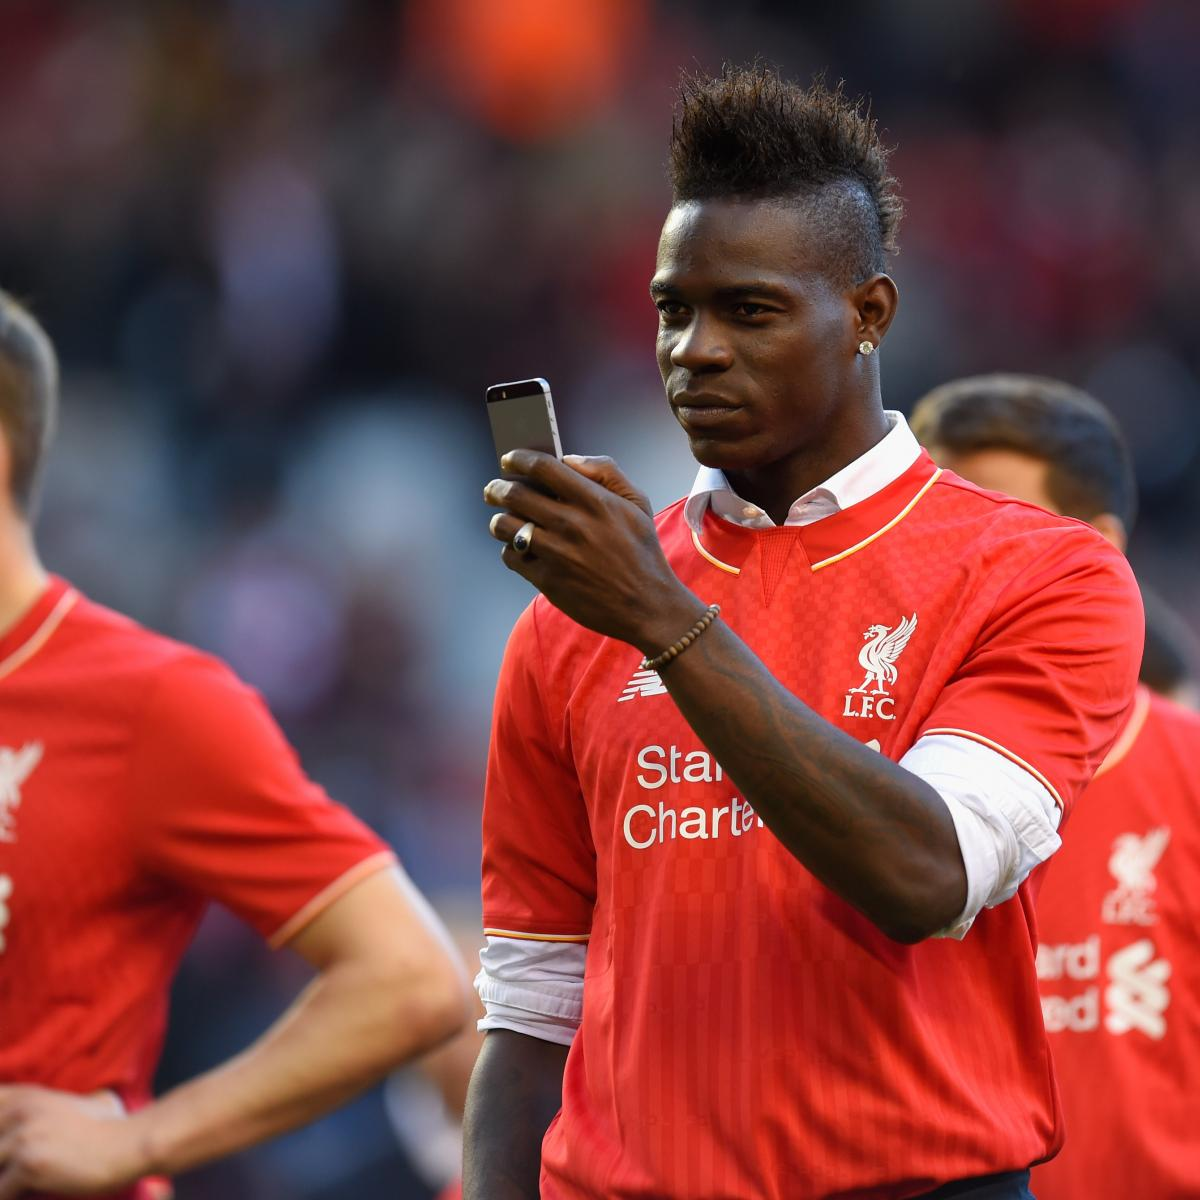 Liverpool Transfer News Lucas Moura Comments On Reds: Liverpool Transfer News: Latest Mario Balotelli, Lucas